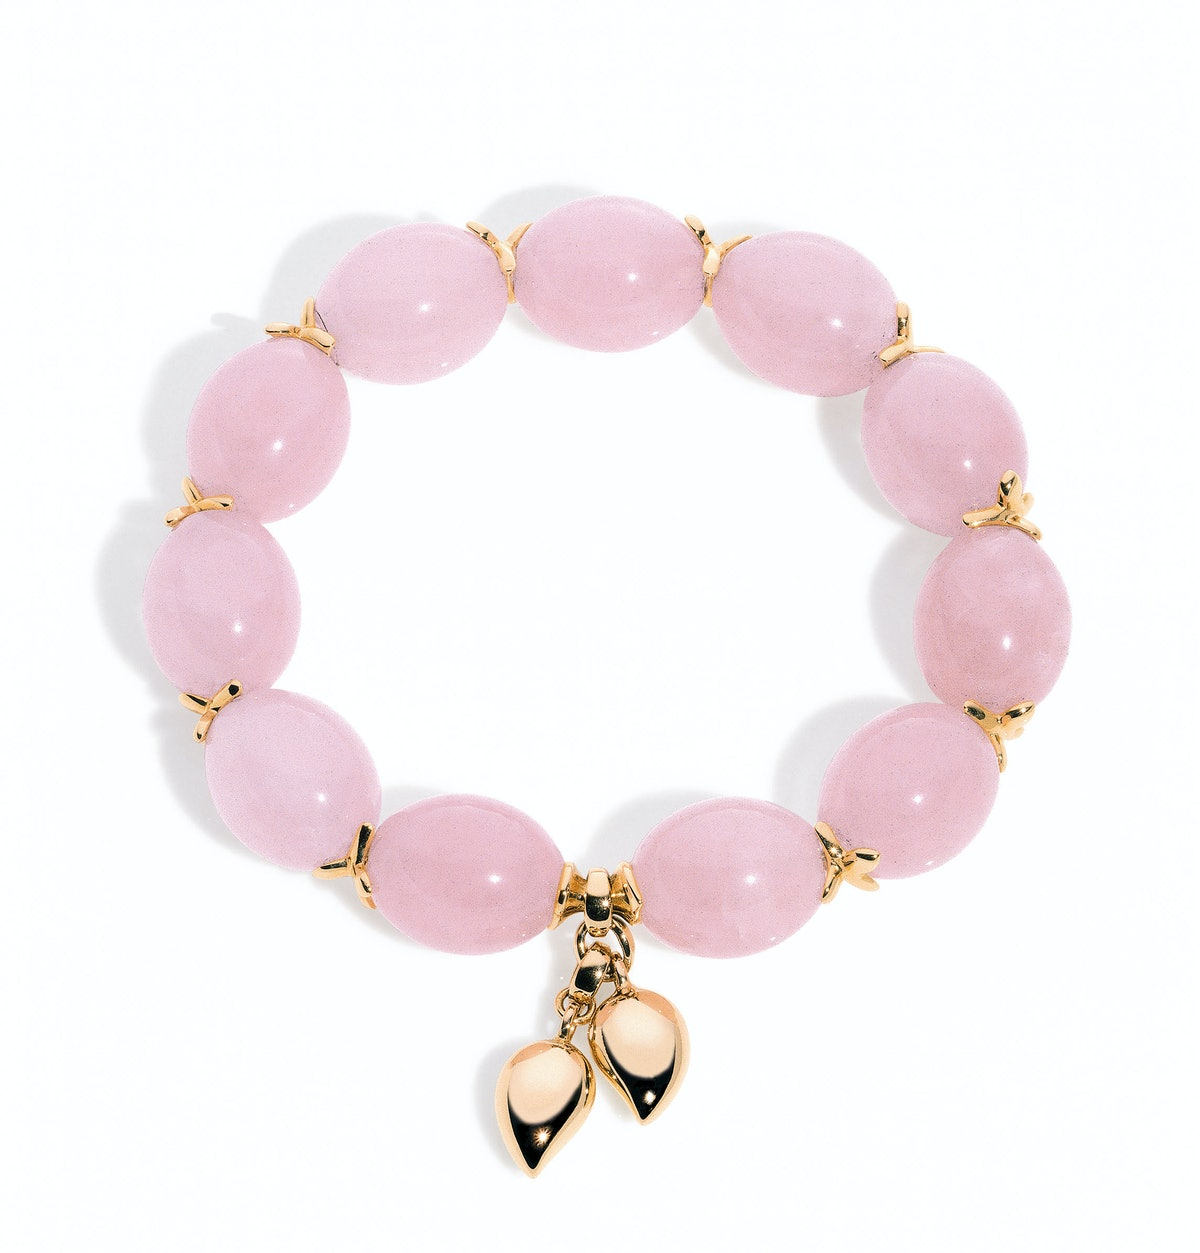 Tamara Comolli Fine Jewelry Collection gold and chalcedony bracelet